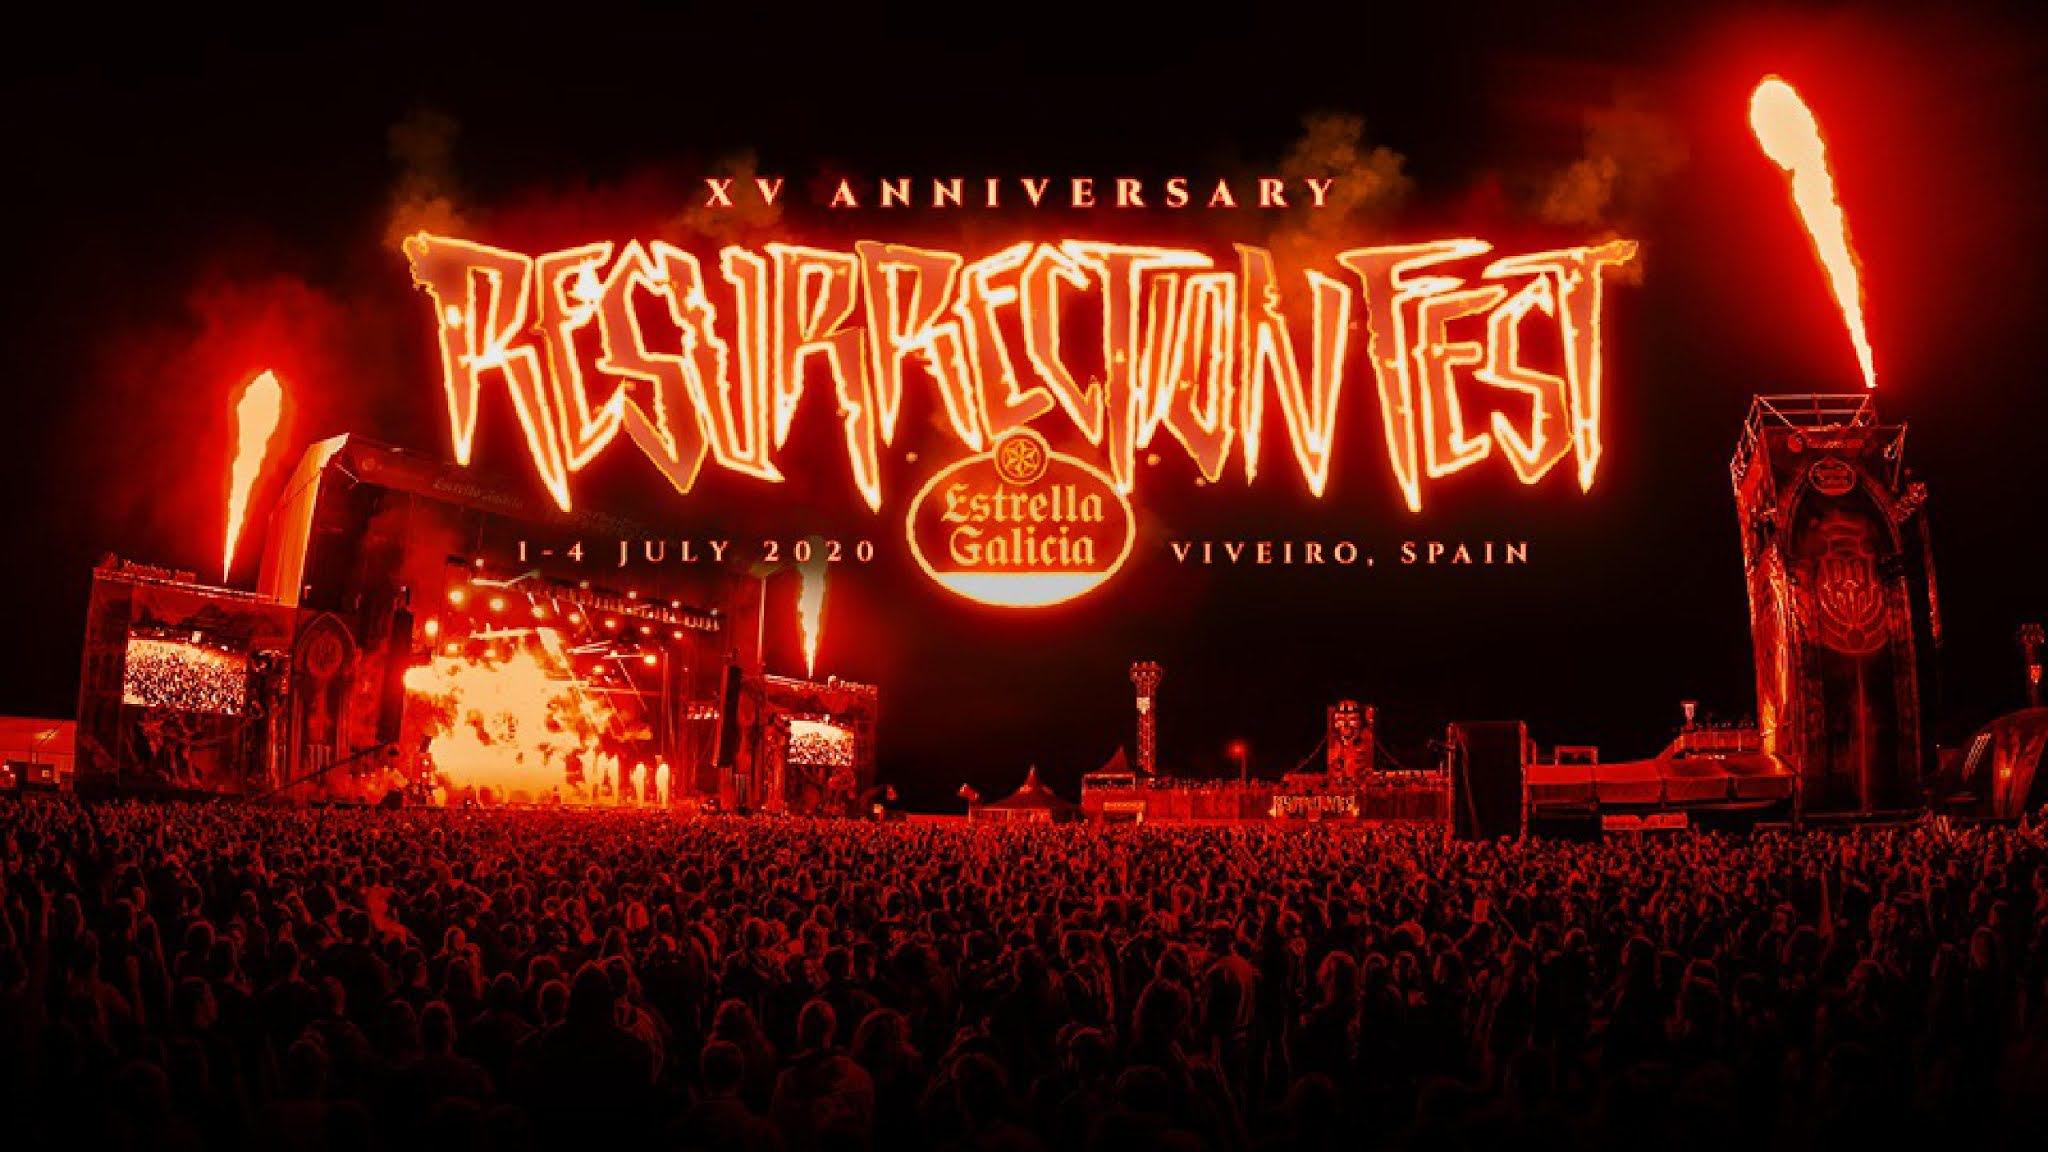 Documental Resurrection Fest, la historia del festival Online